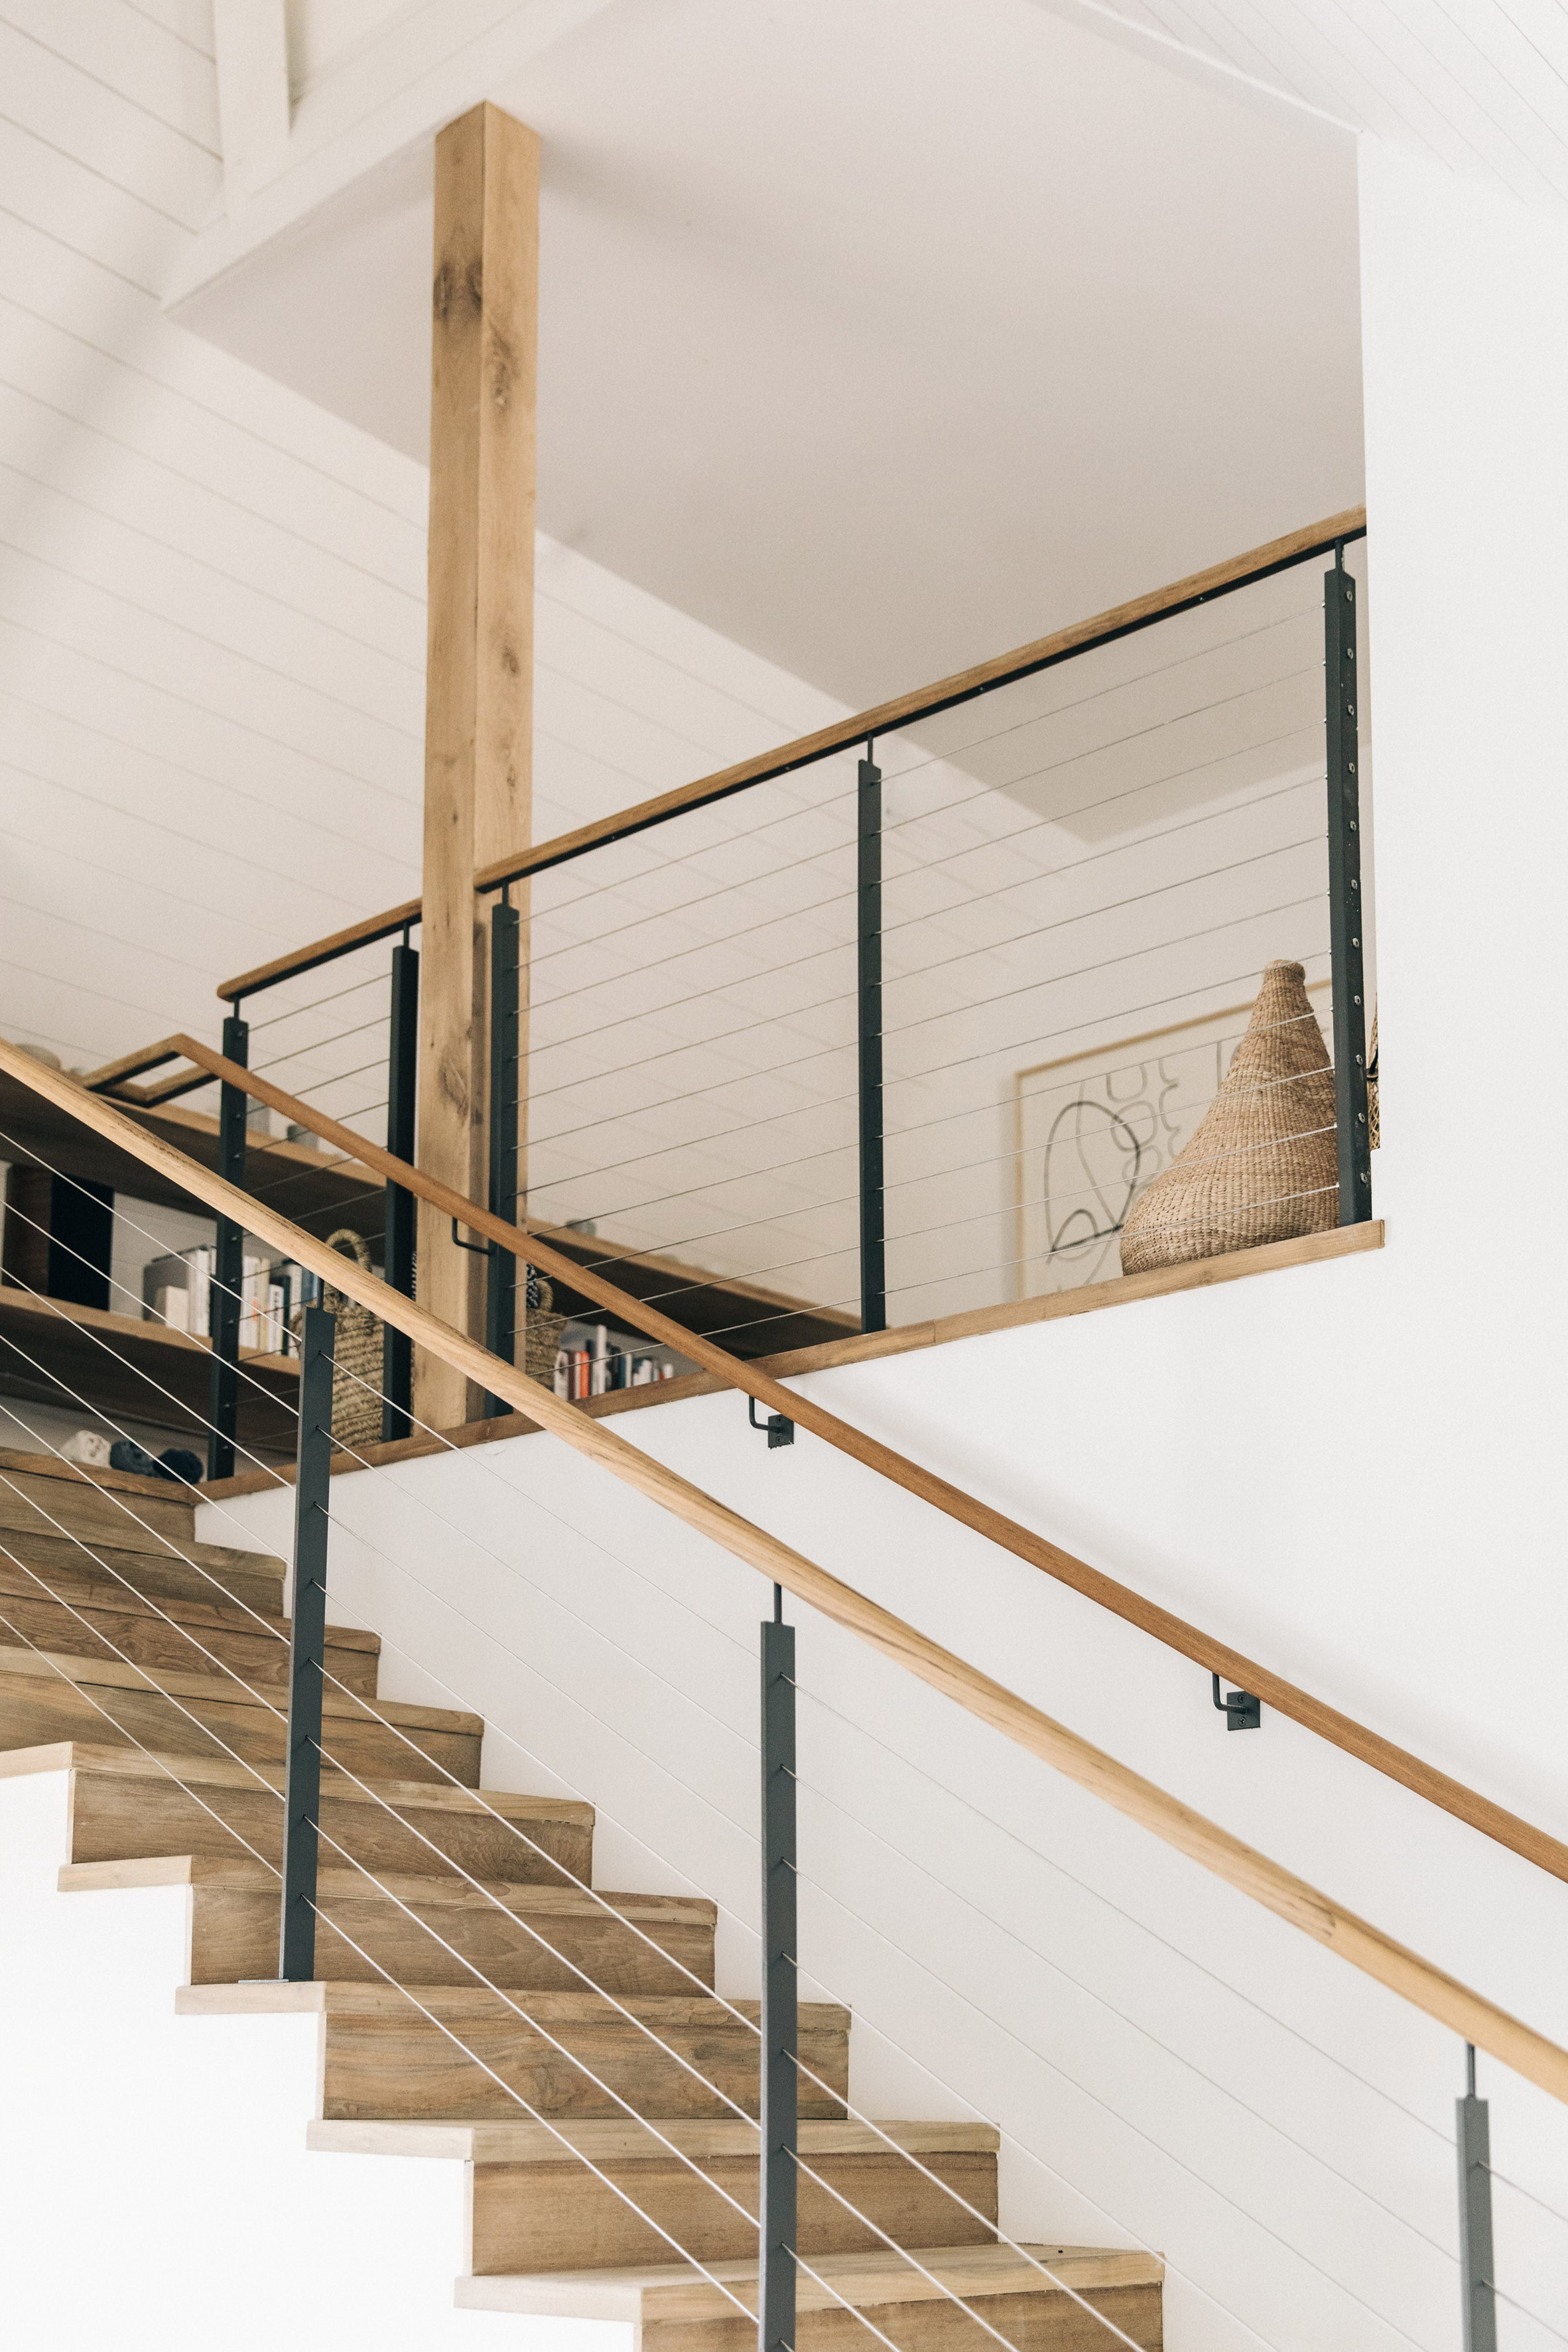 The Surfrider Hotel Malibu by Matthew Goodwin